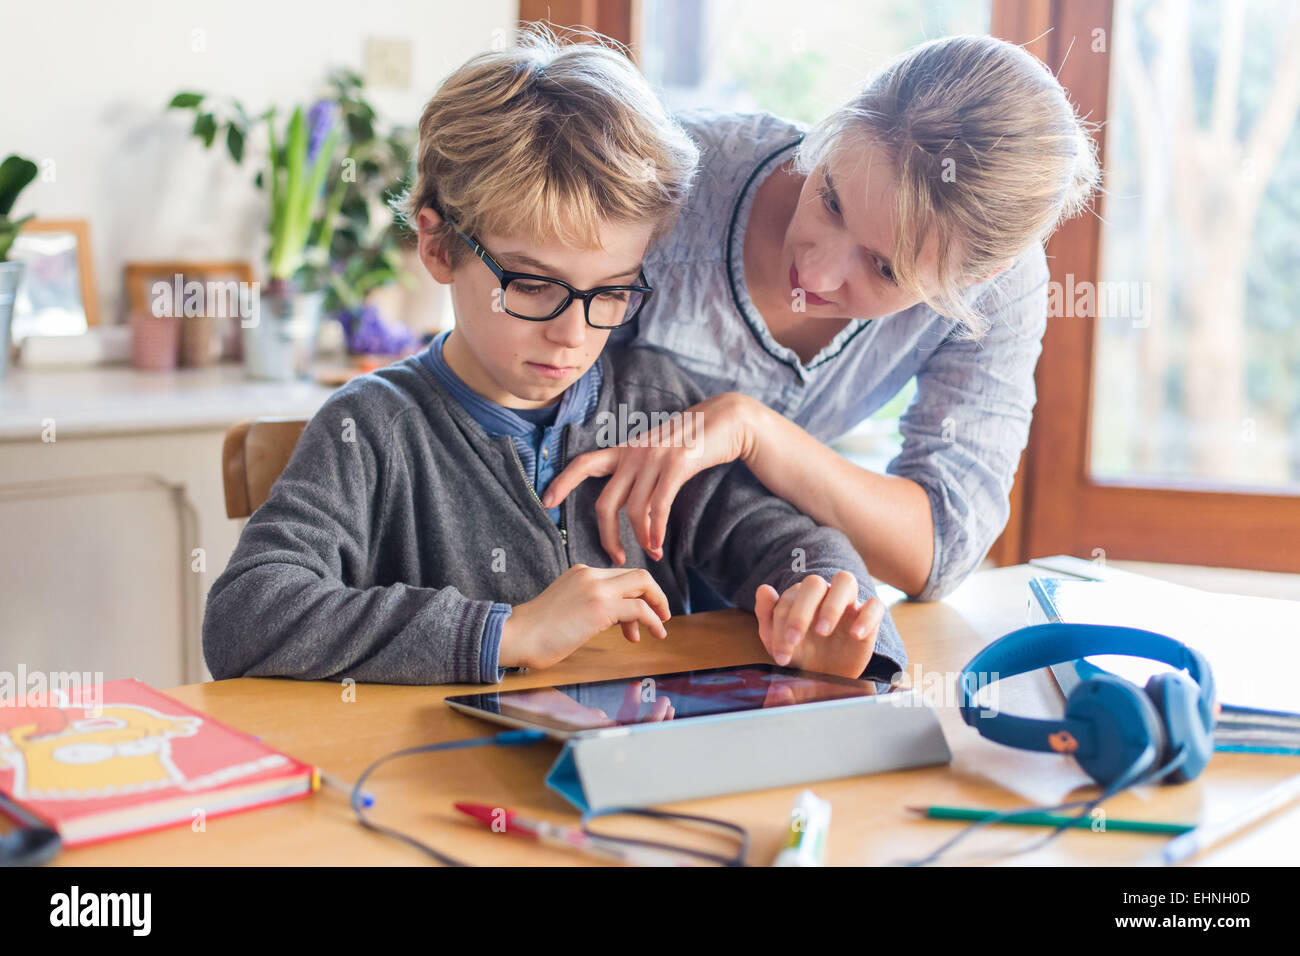 8 Jahre alter Junge mit Tablet-Computer. Stockbild